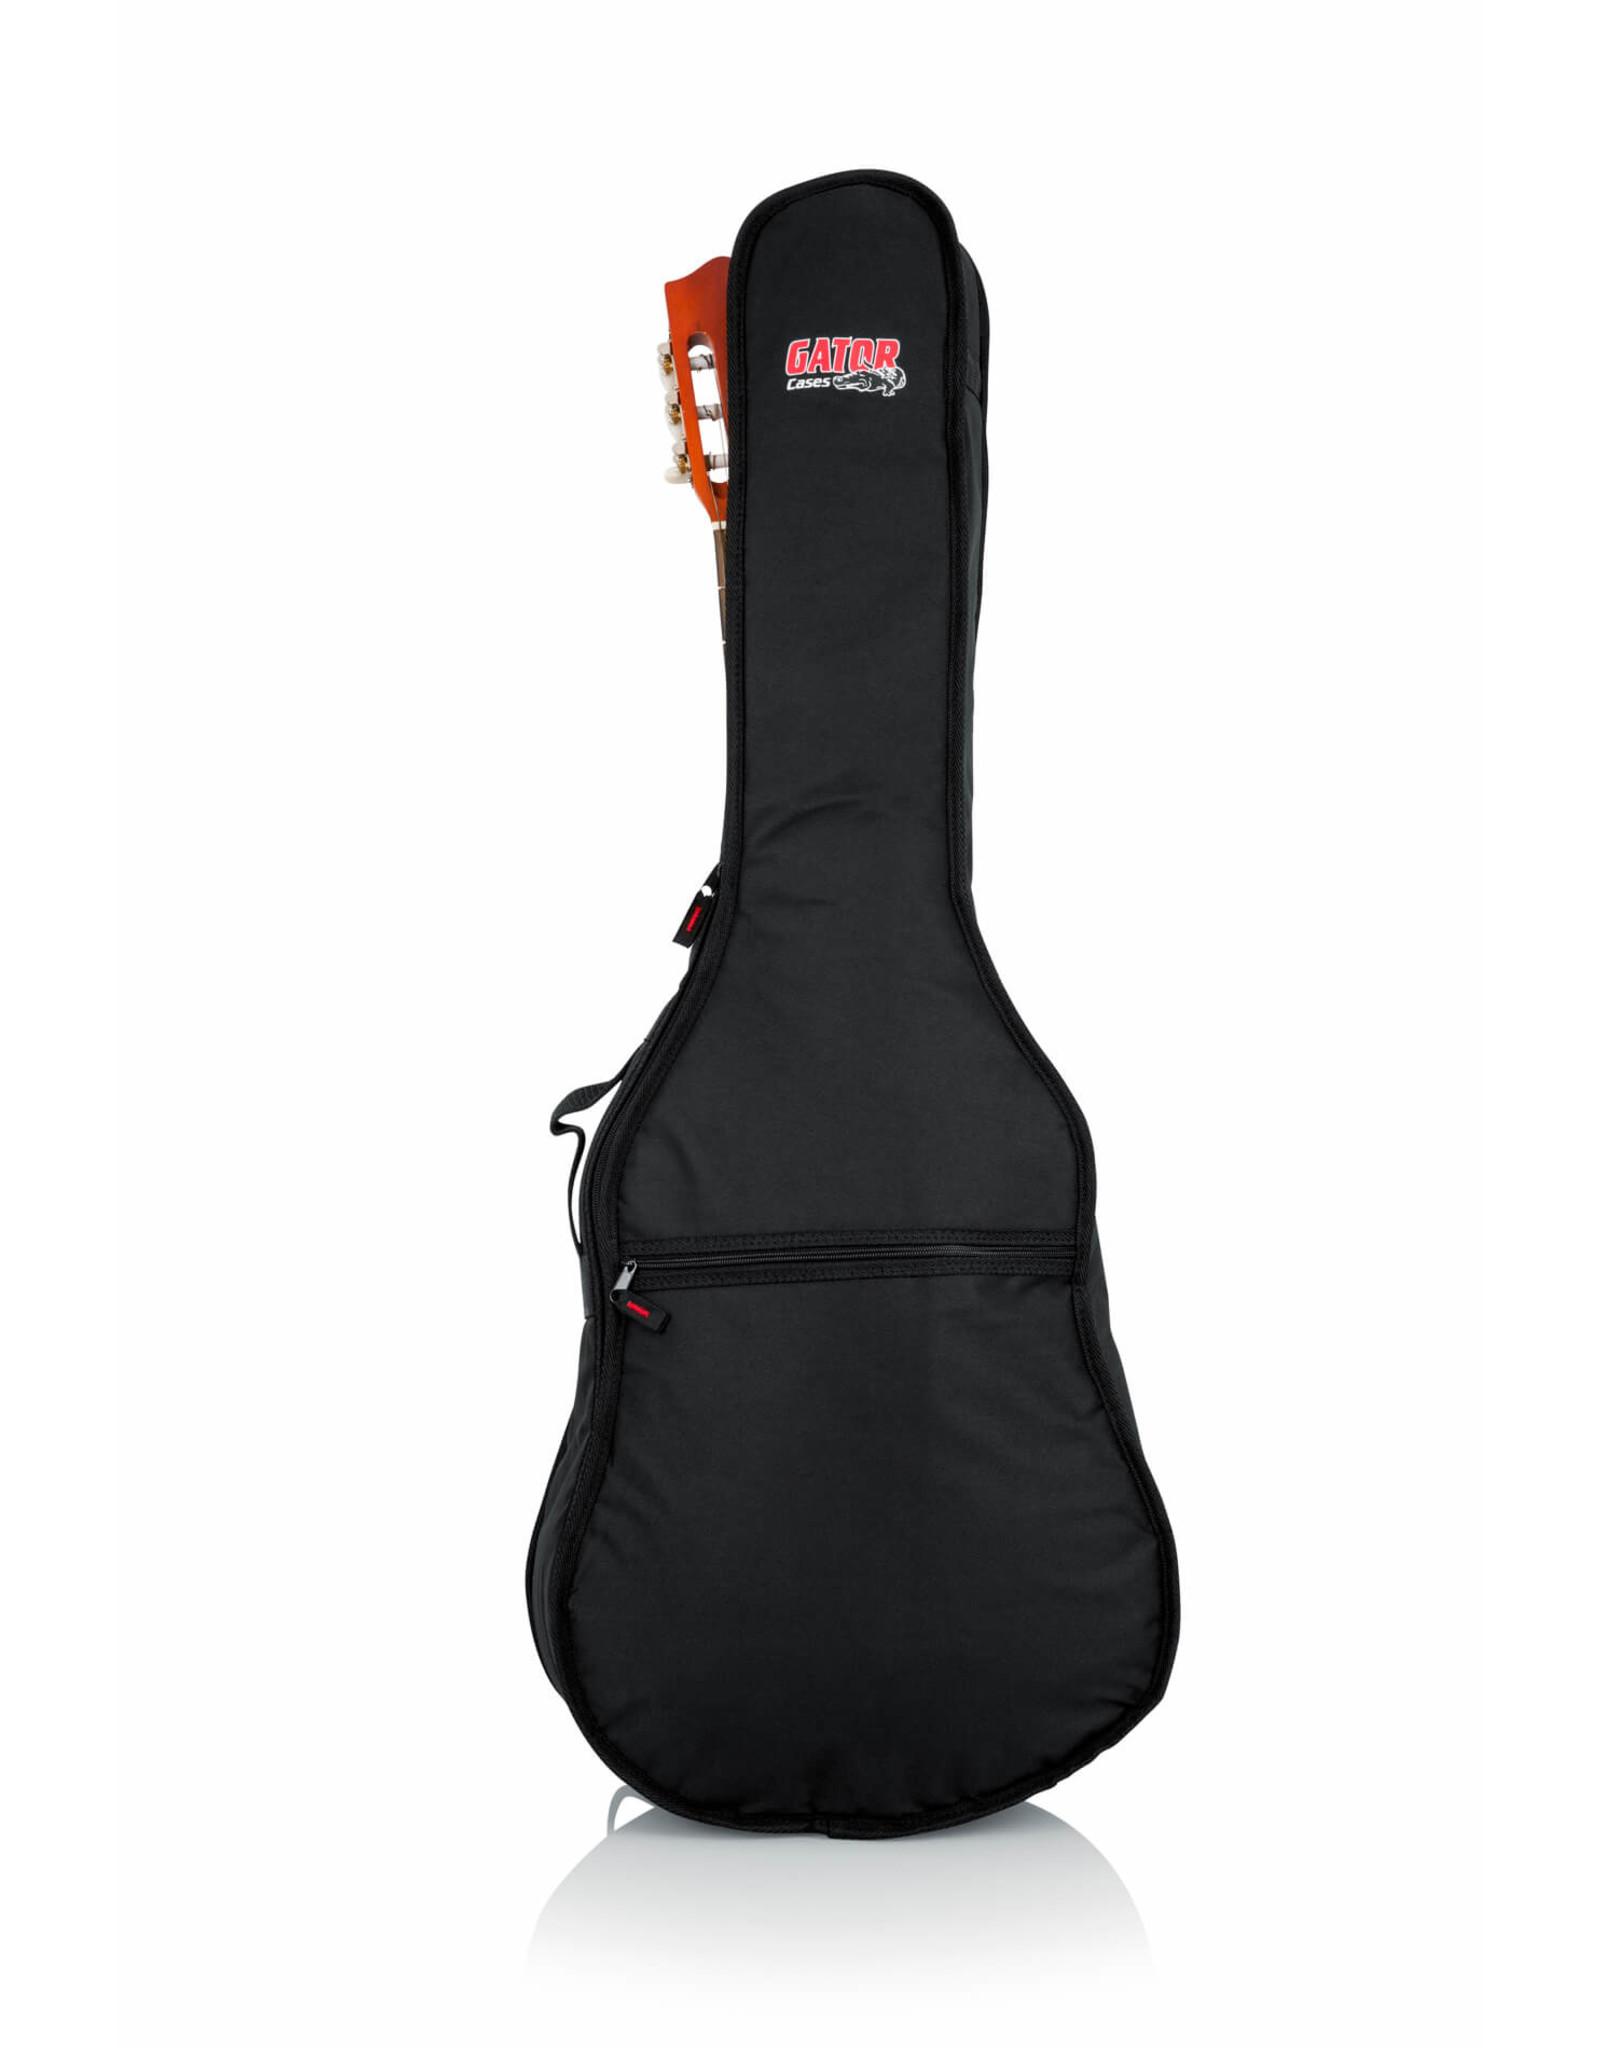 Gator Cases Gator GBE Classical Guitar Gig Bag